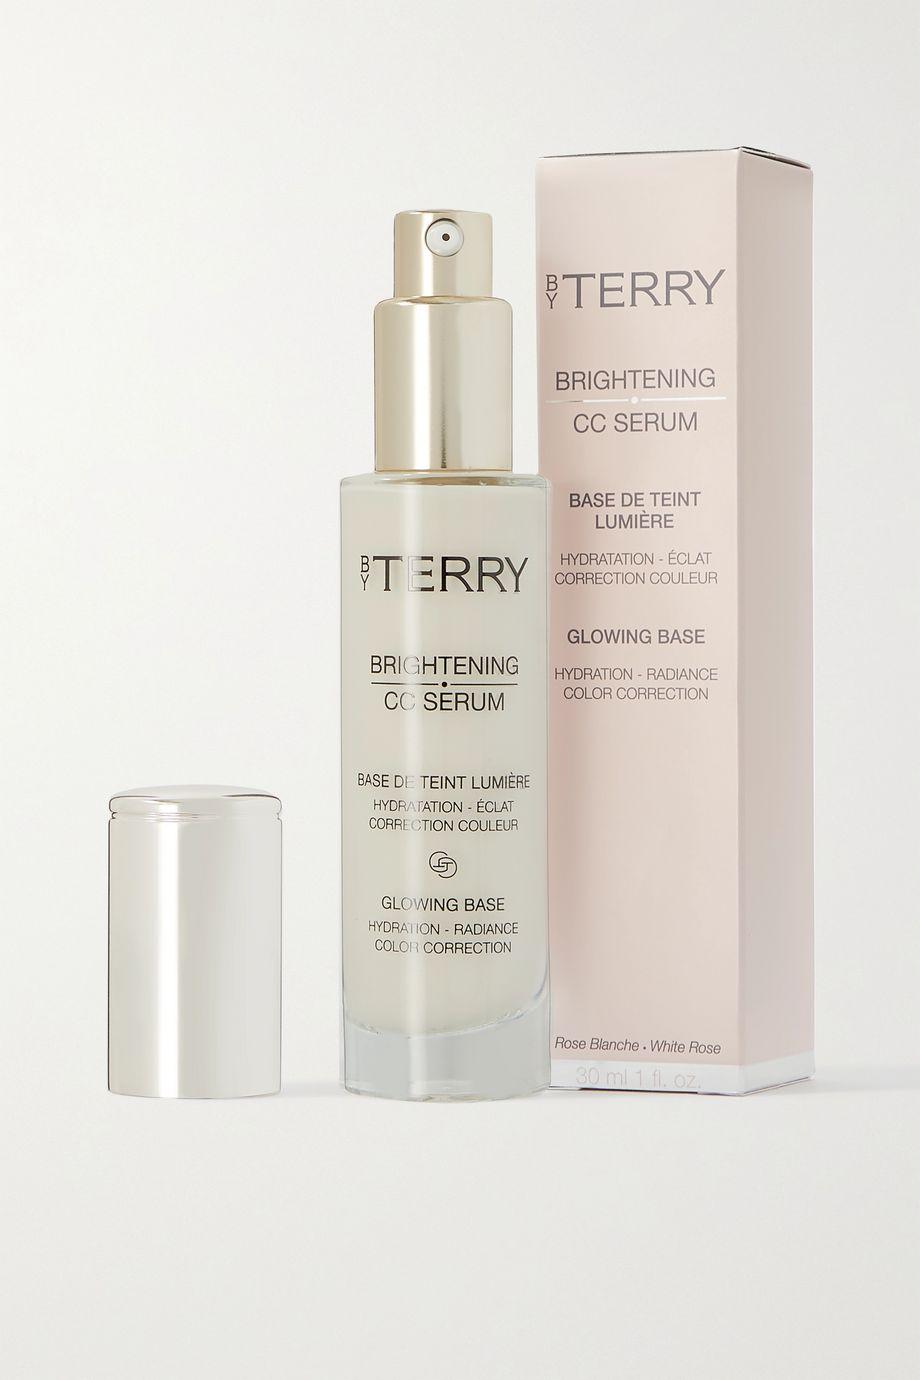 BY TERRY Cellularose® Brightening CC Lumi-Serum - Immaculate Light, 30ml